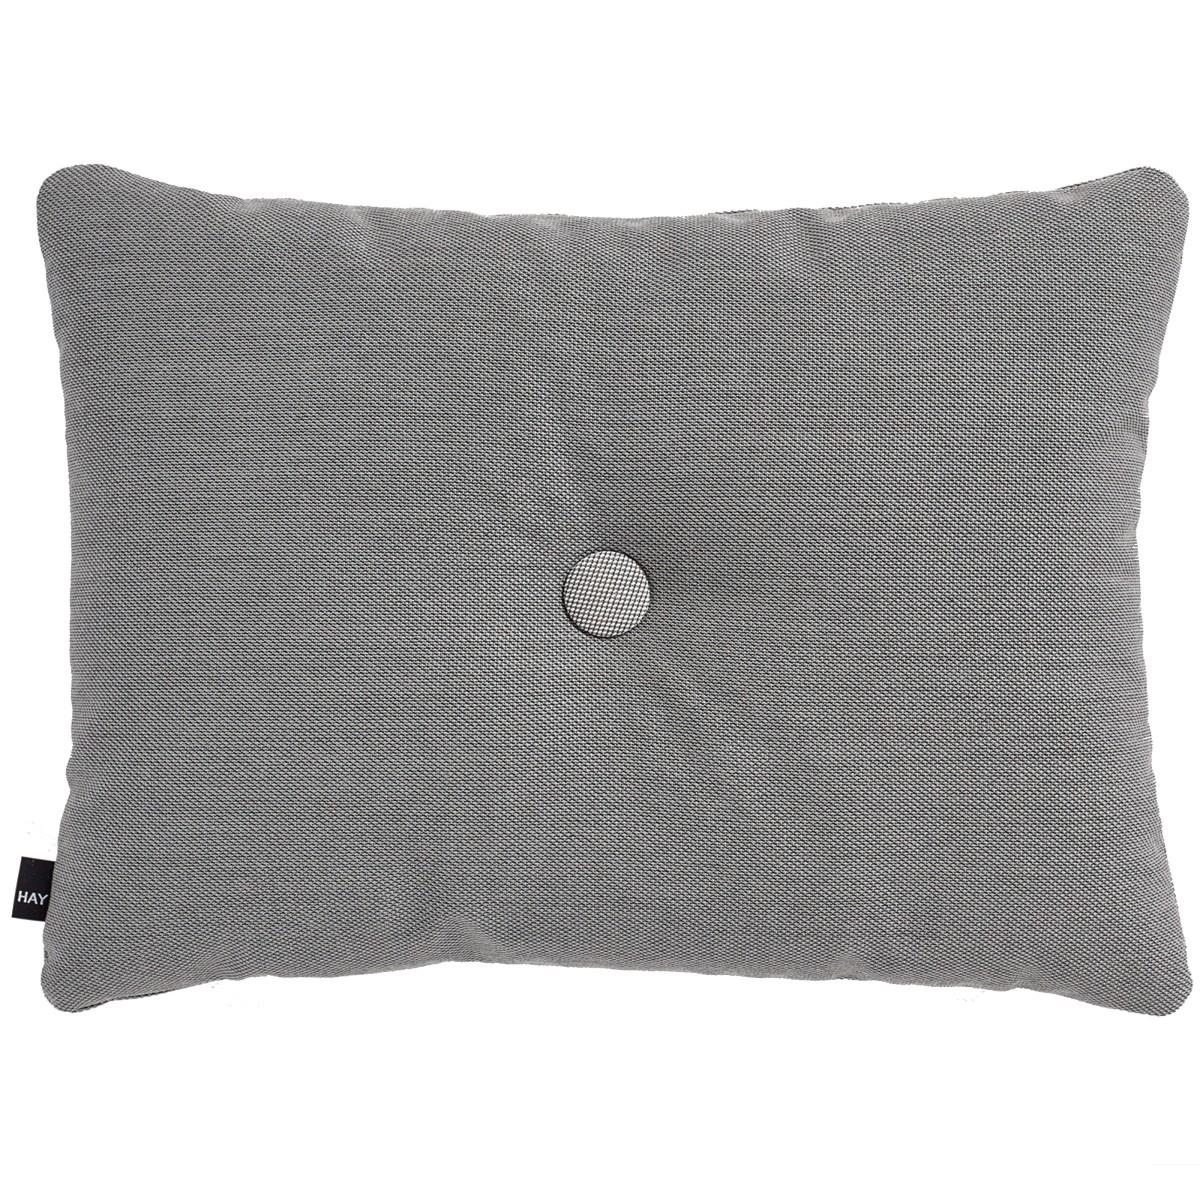 https://www.fundesign.nl/media/catalog/product/h/a/hay-dot-cushion-steelcut-trio-dark-grijs.jpg